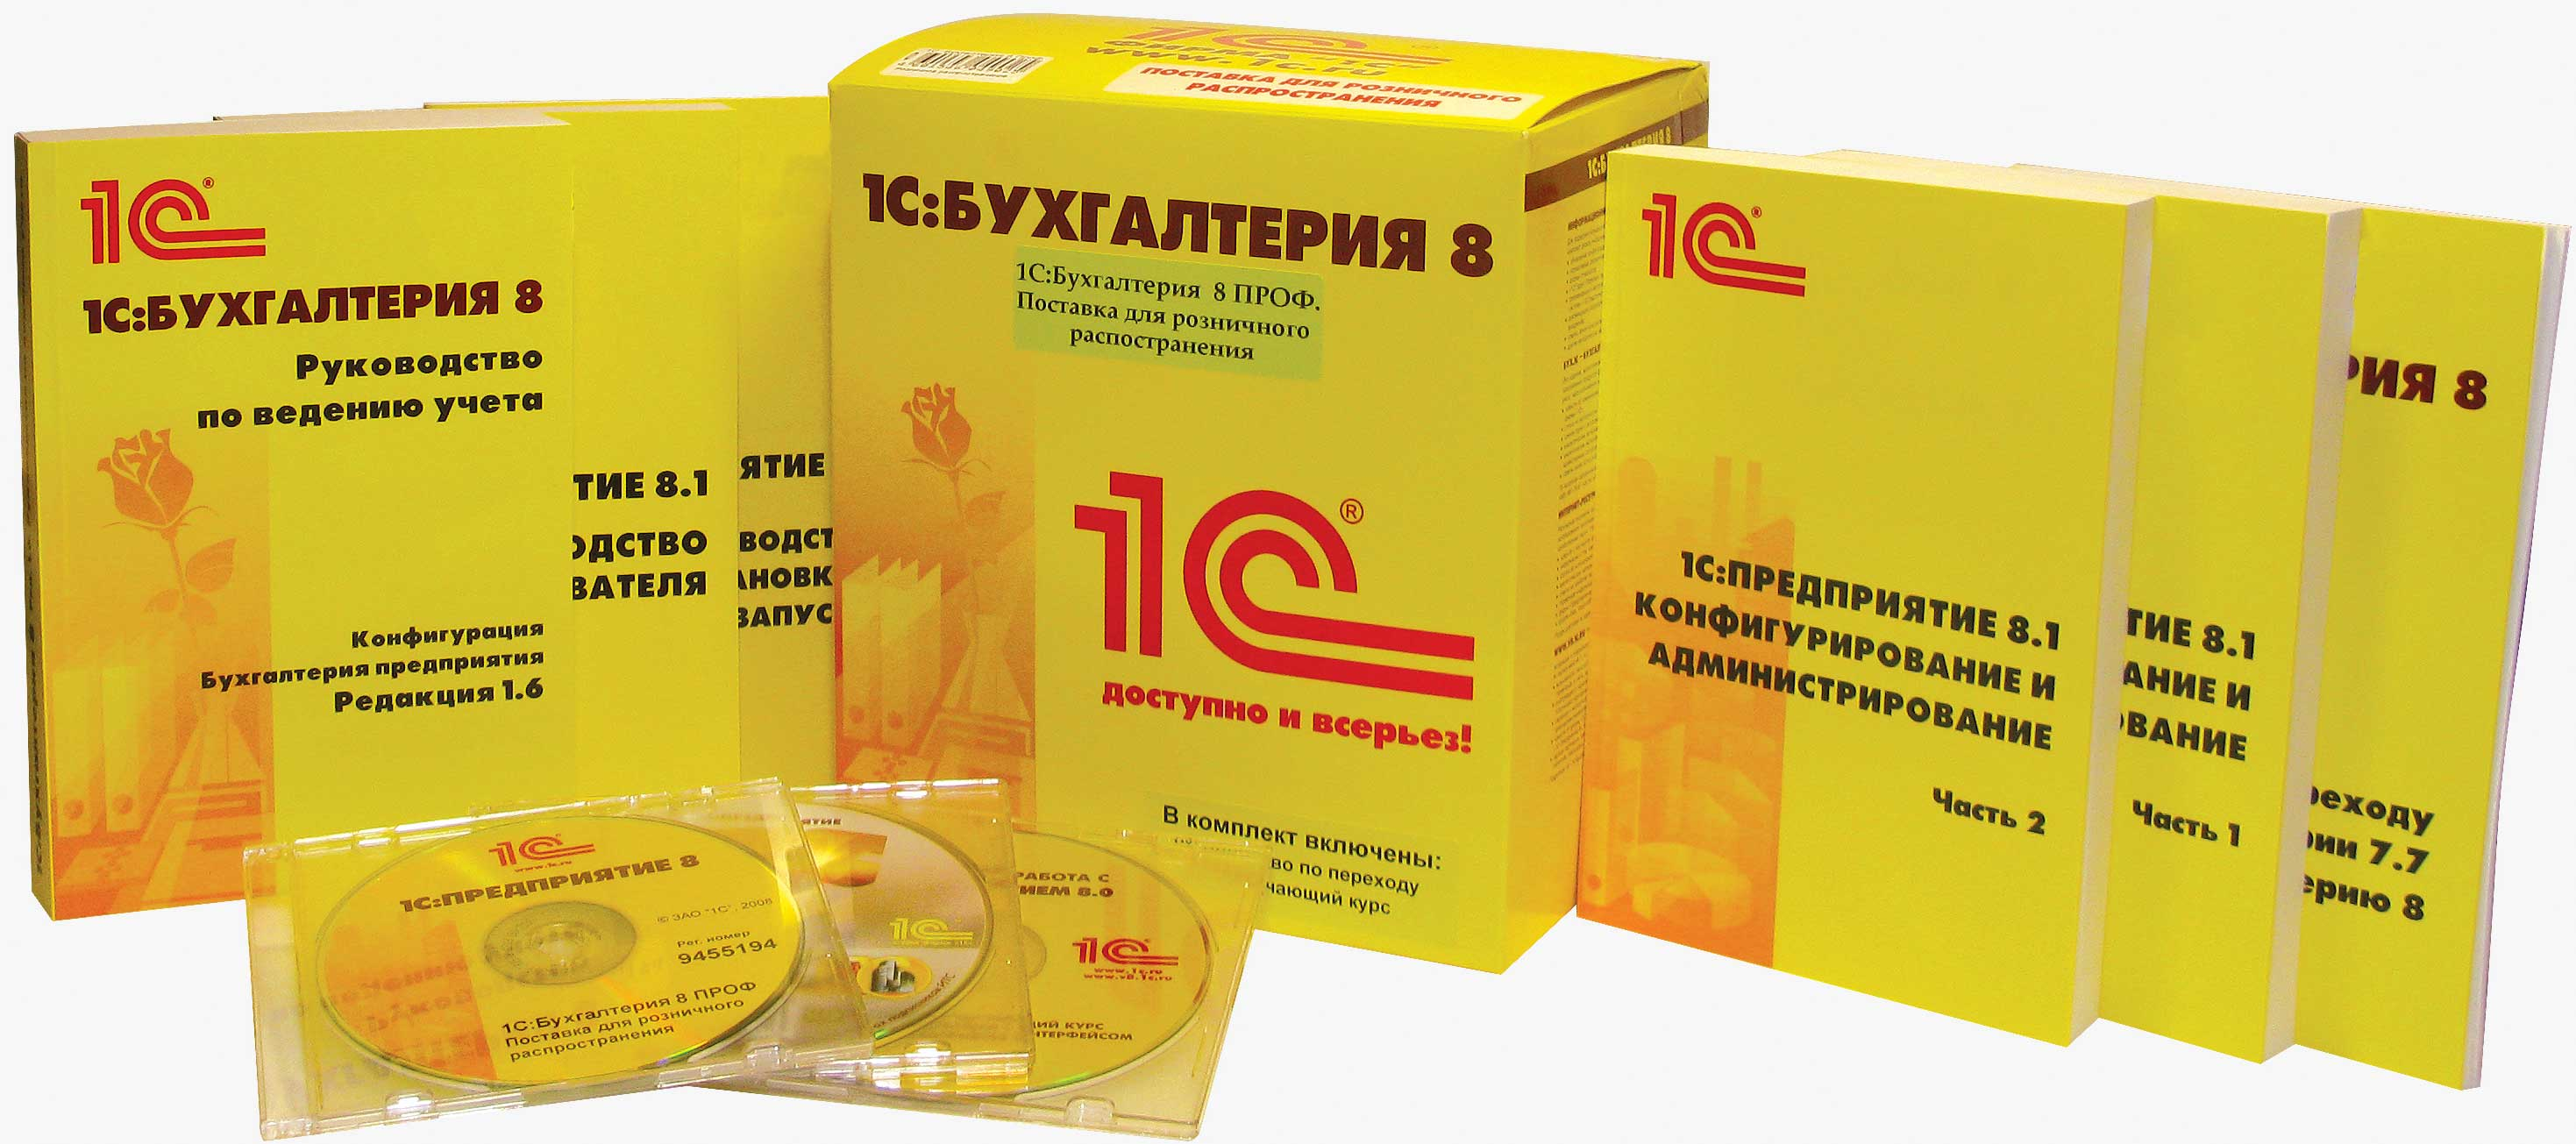 http://infa-education.ru/images/1C-Buh8Prof.jpg